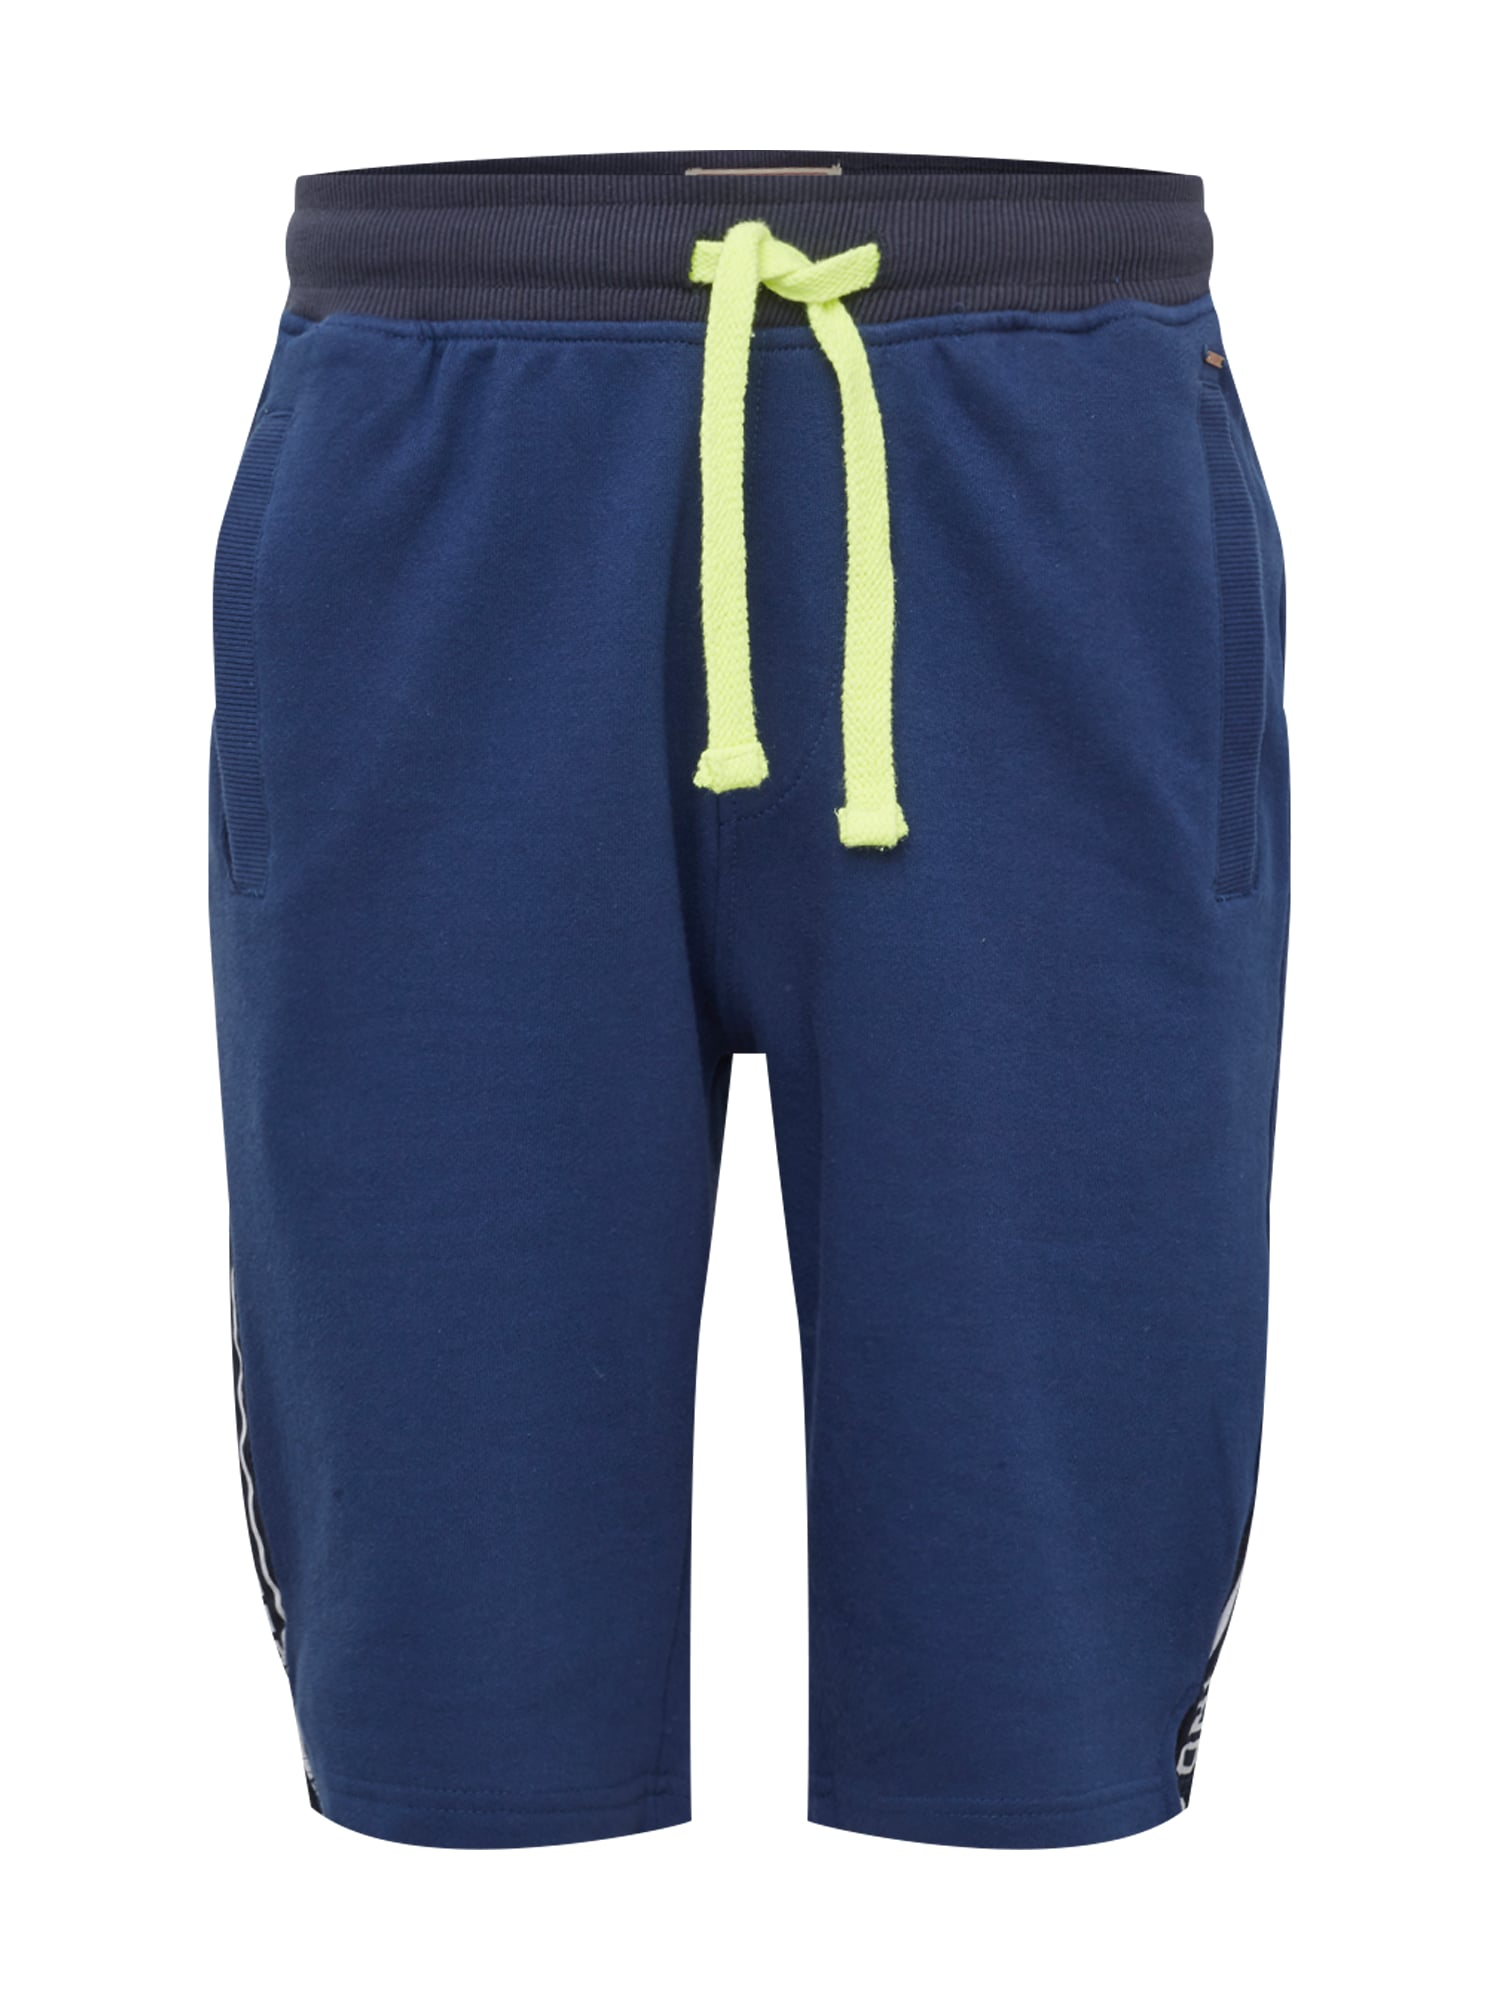 Kalhoty tmavě modrá svítivě žlutá bílá Petrol Industries